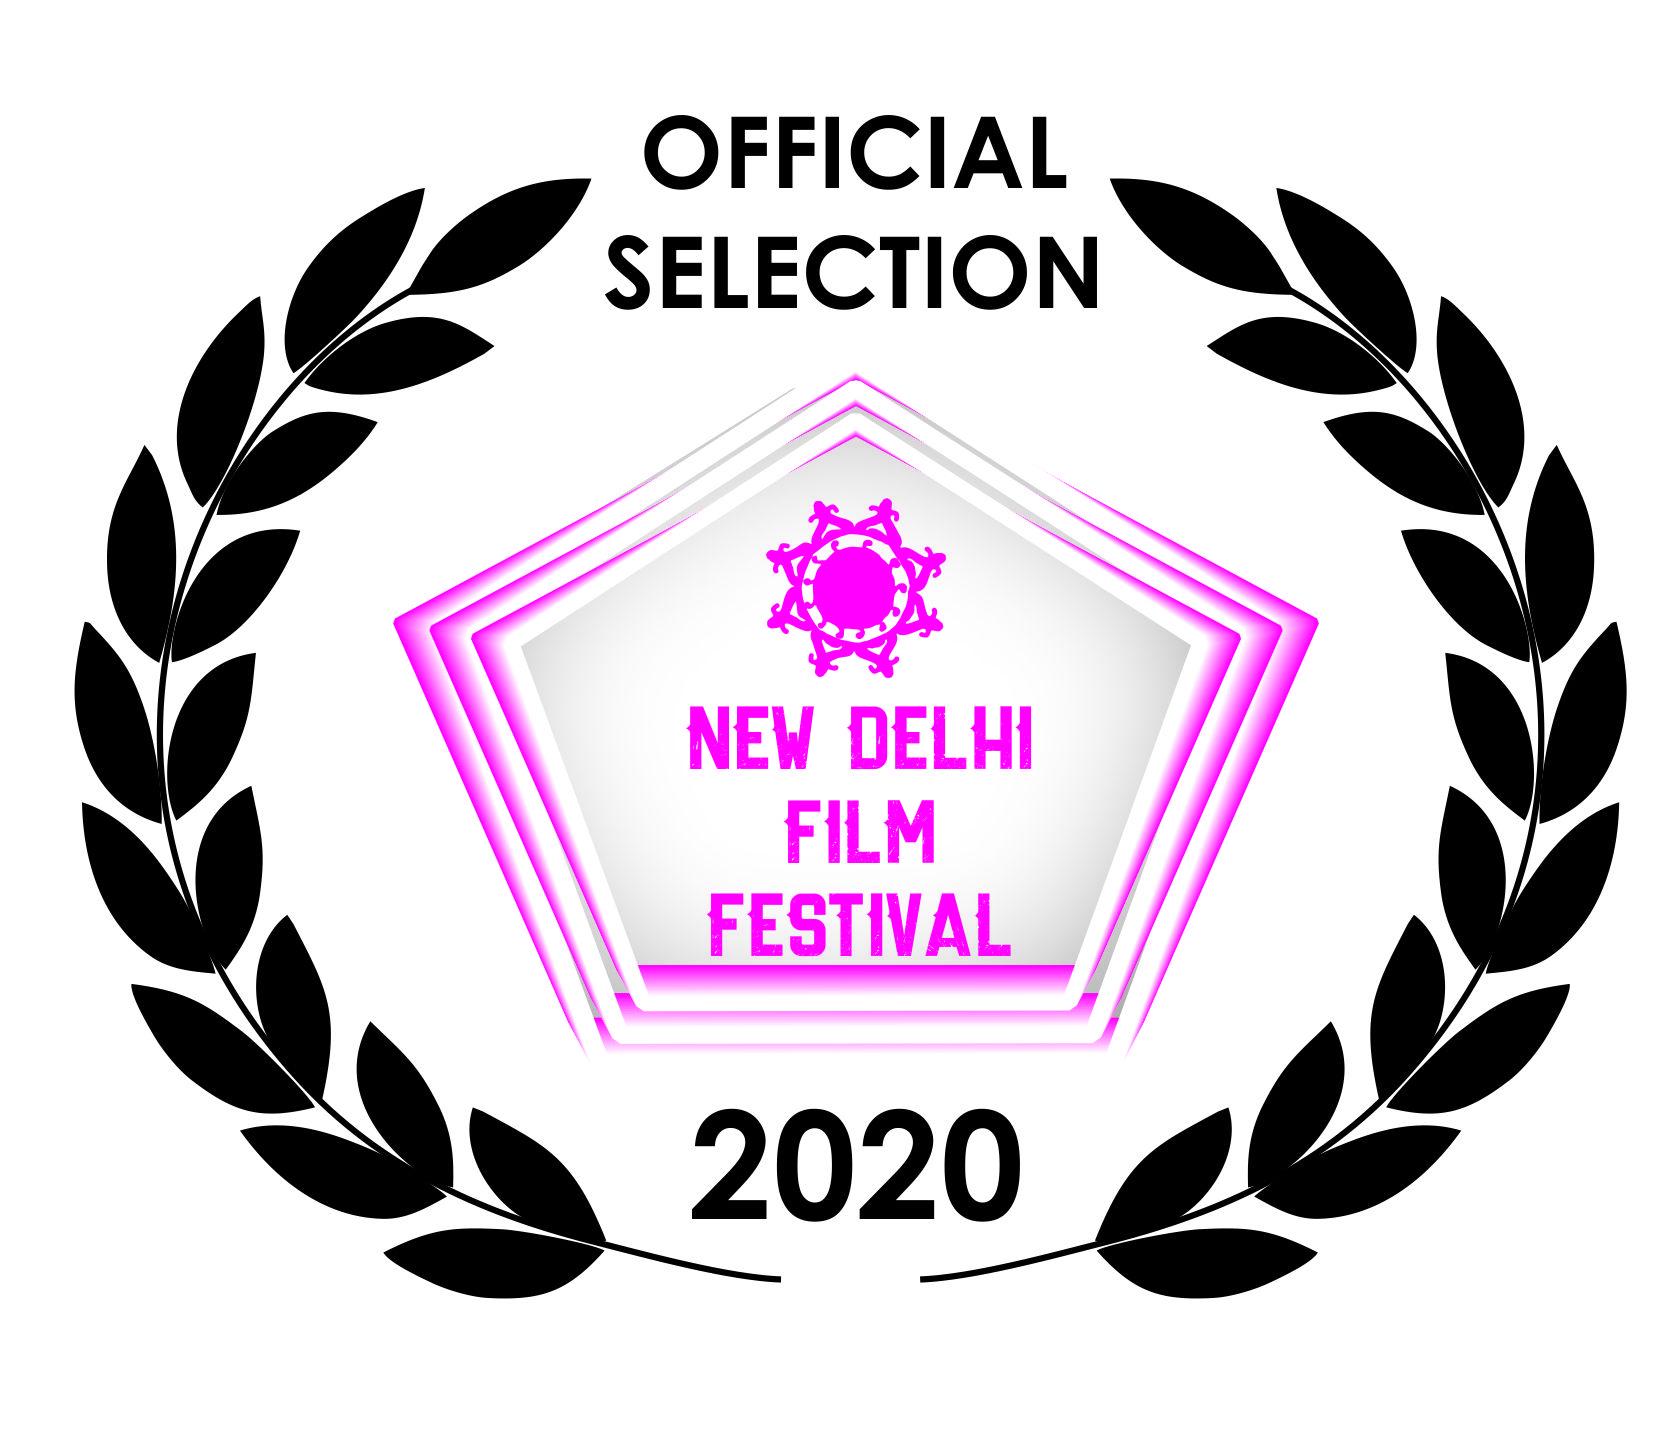 New Delhi Film Festival-NDFF 2020